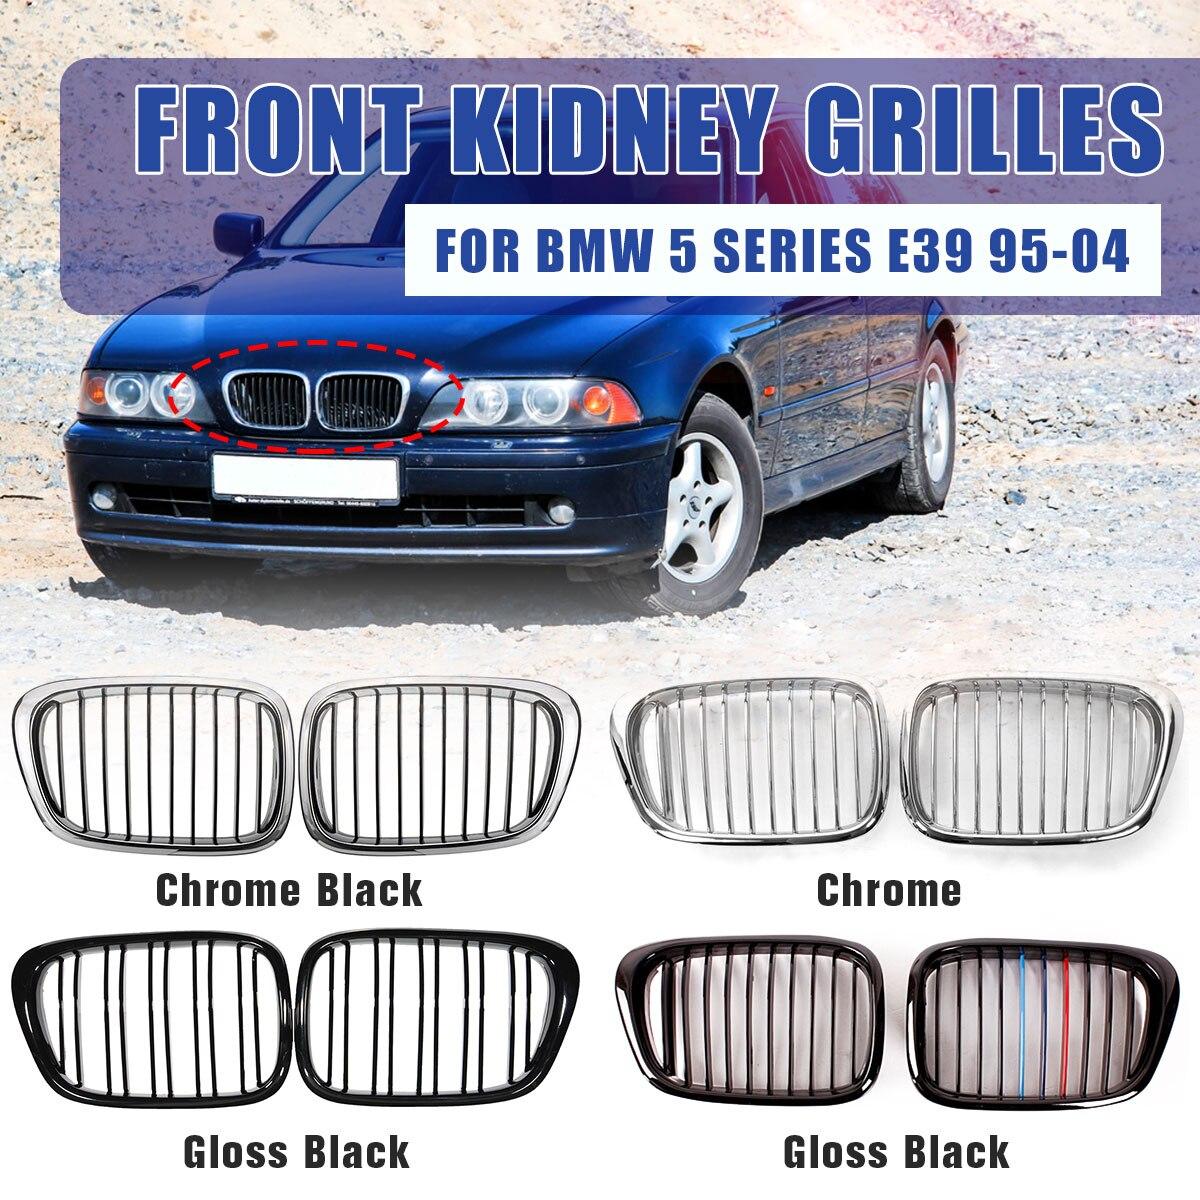 2Pcs รถด้านหน้า M สี Kidney Grille สำหรับ BMW E39 5 Series 525 528 530 540 m5 1997 1998 1999 2000 2001 2002 2003